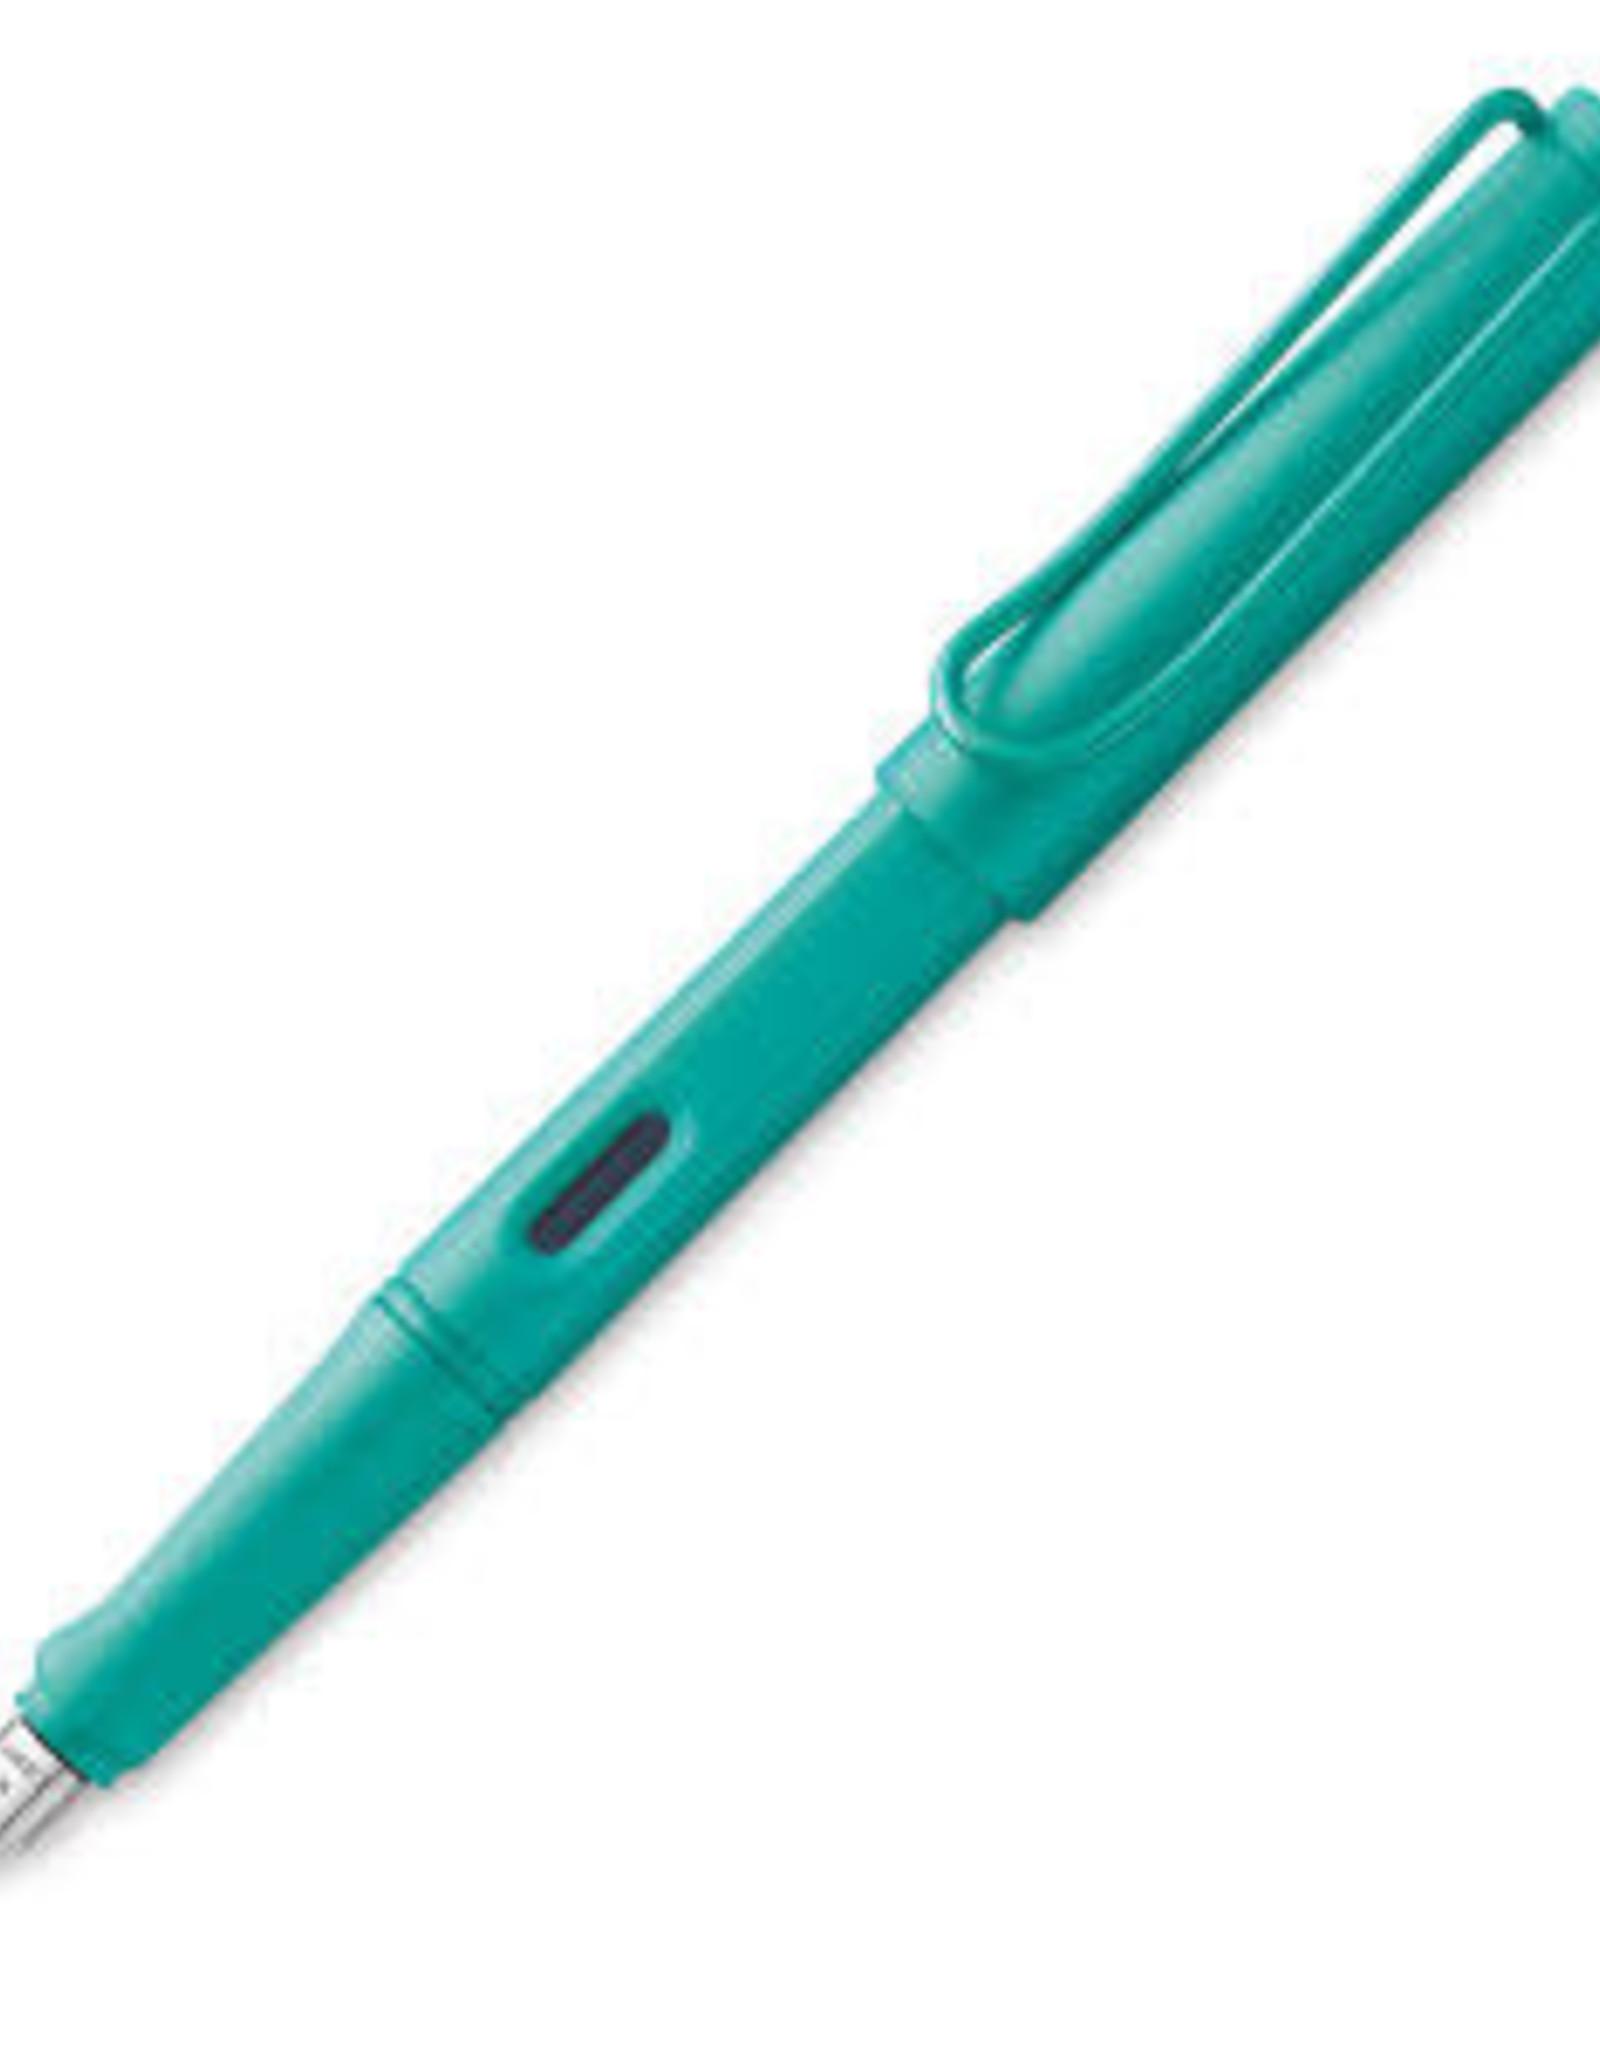 Lamy Lamy Safari Fountain Pen F